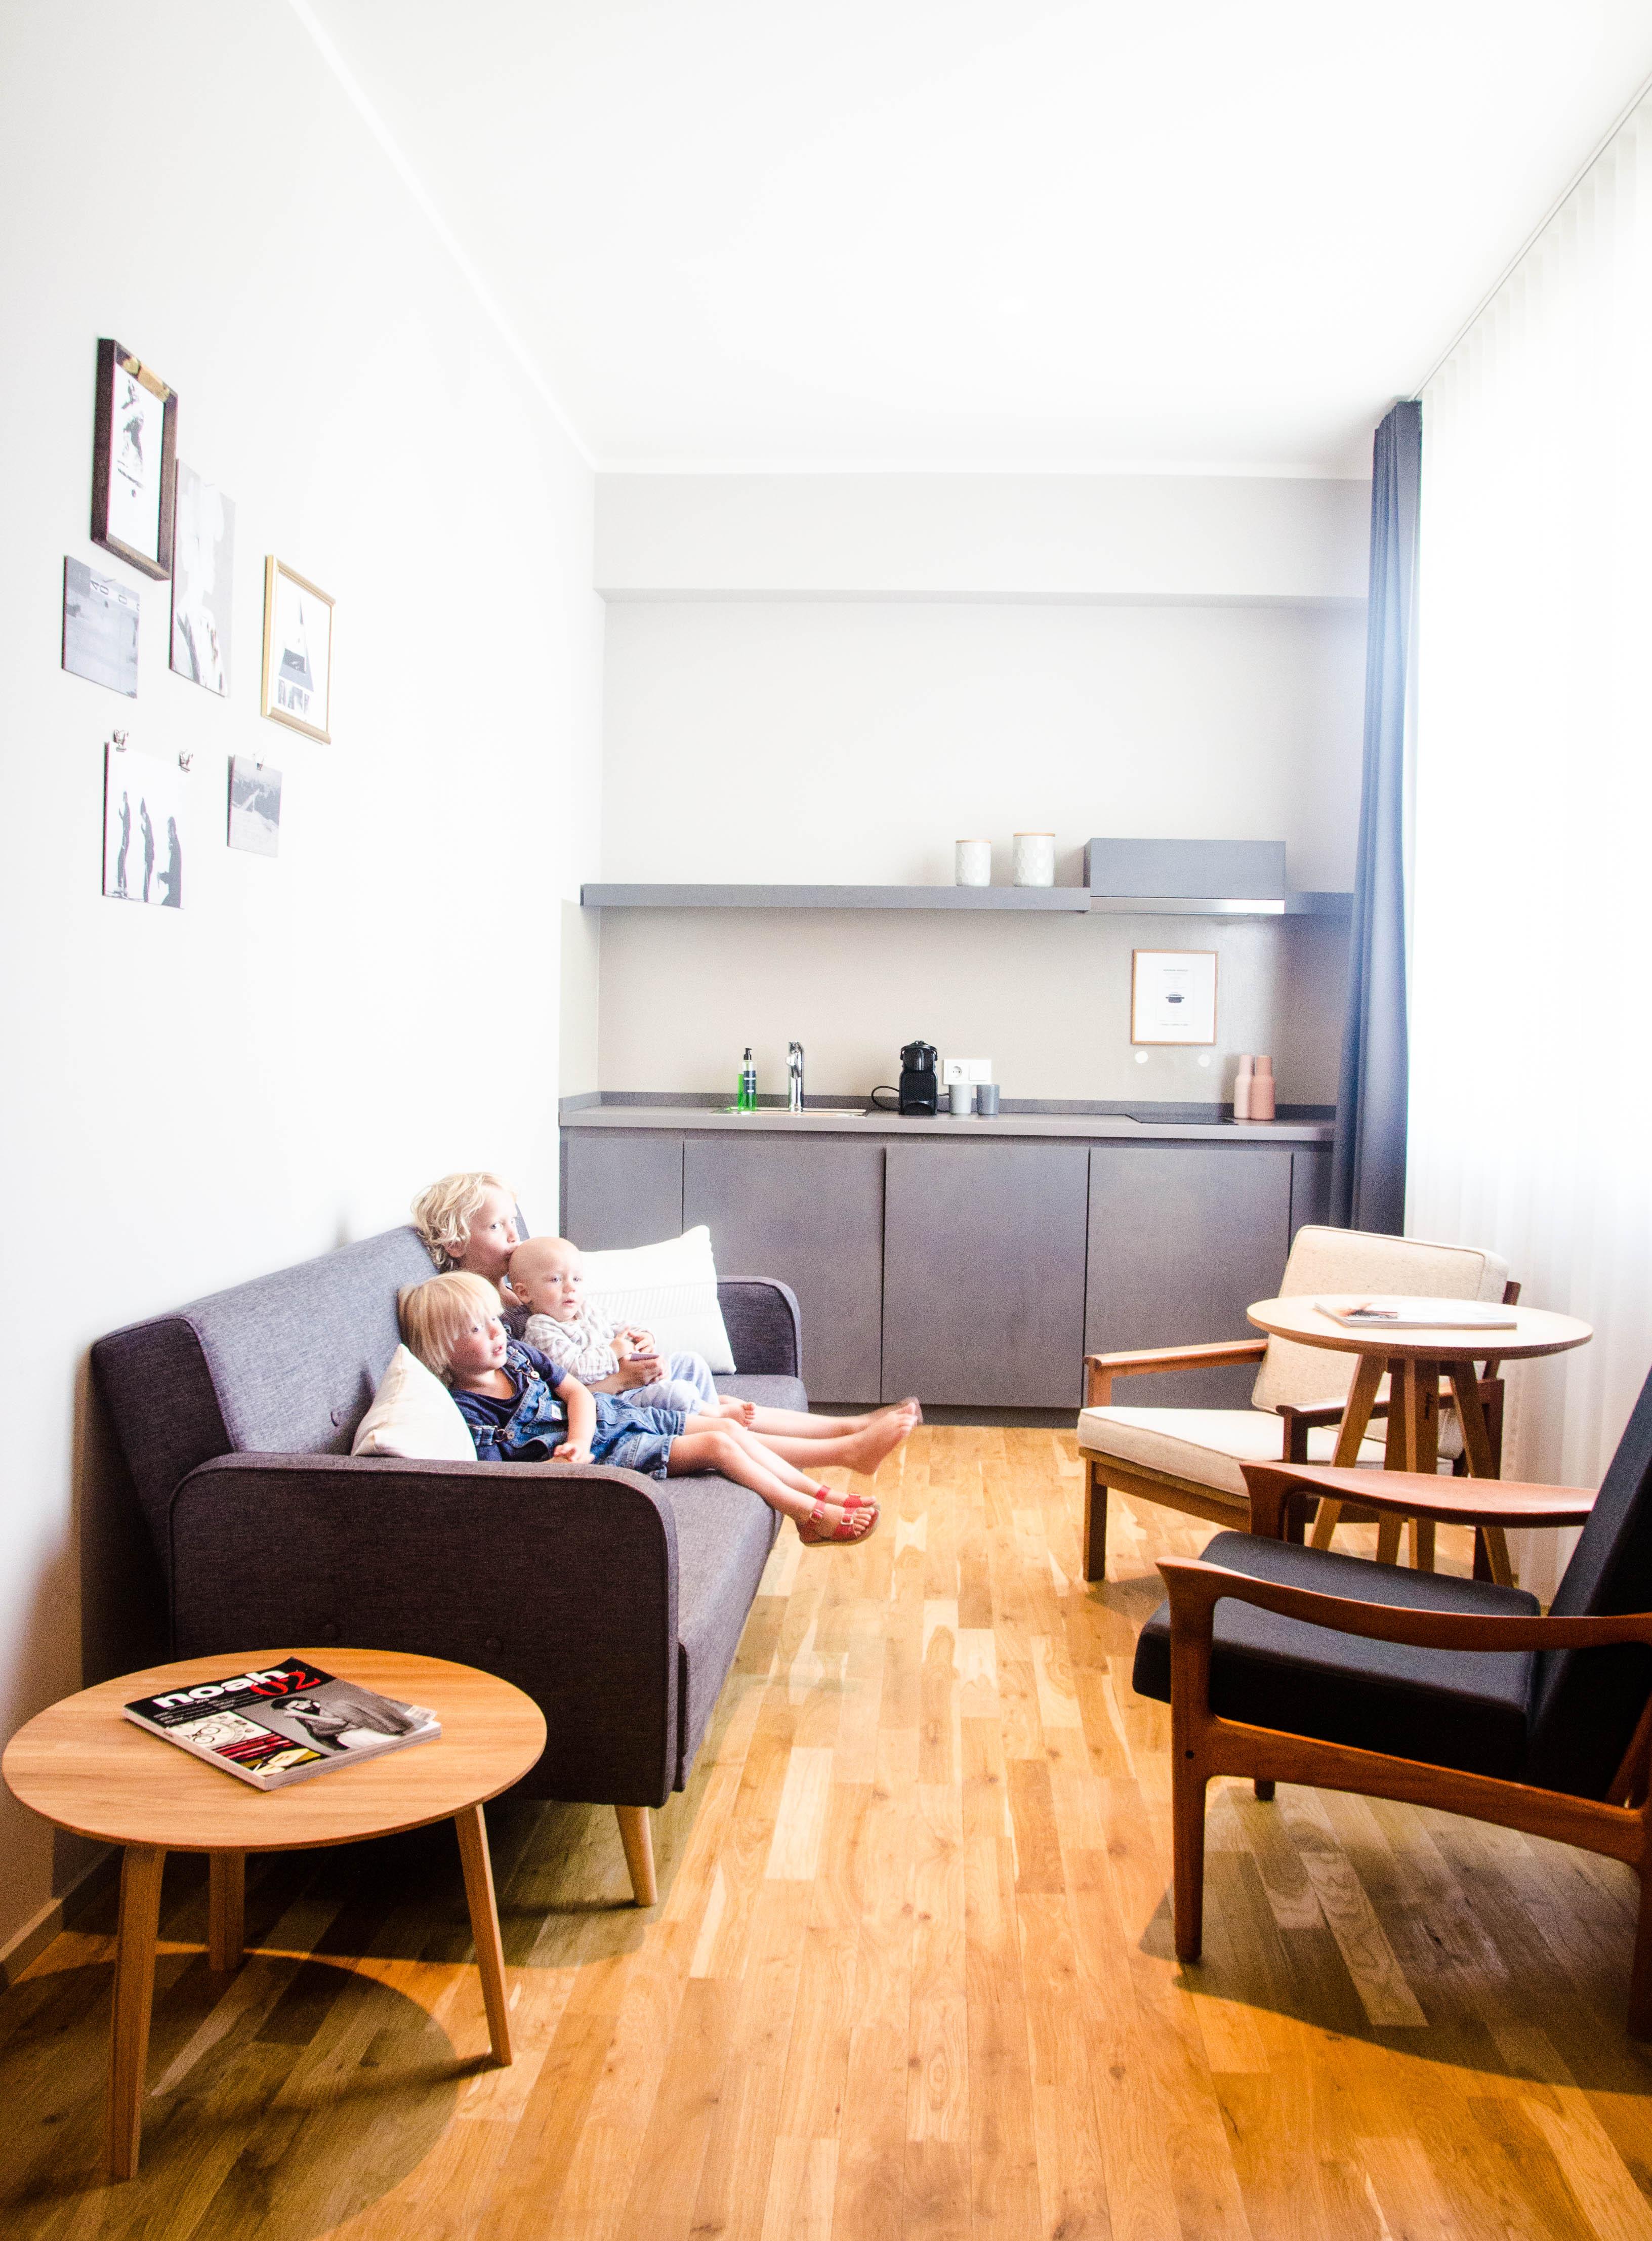 psst hier kommt ein tolles hotel in m nchen wasf rmich. Black Bedroom Furniture Sets. Home Design Ideas